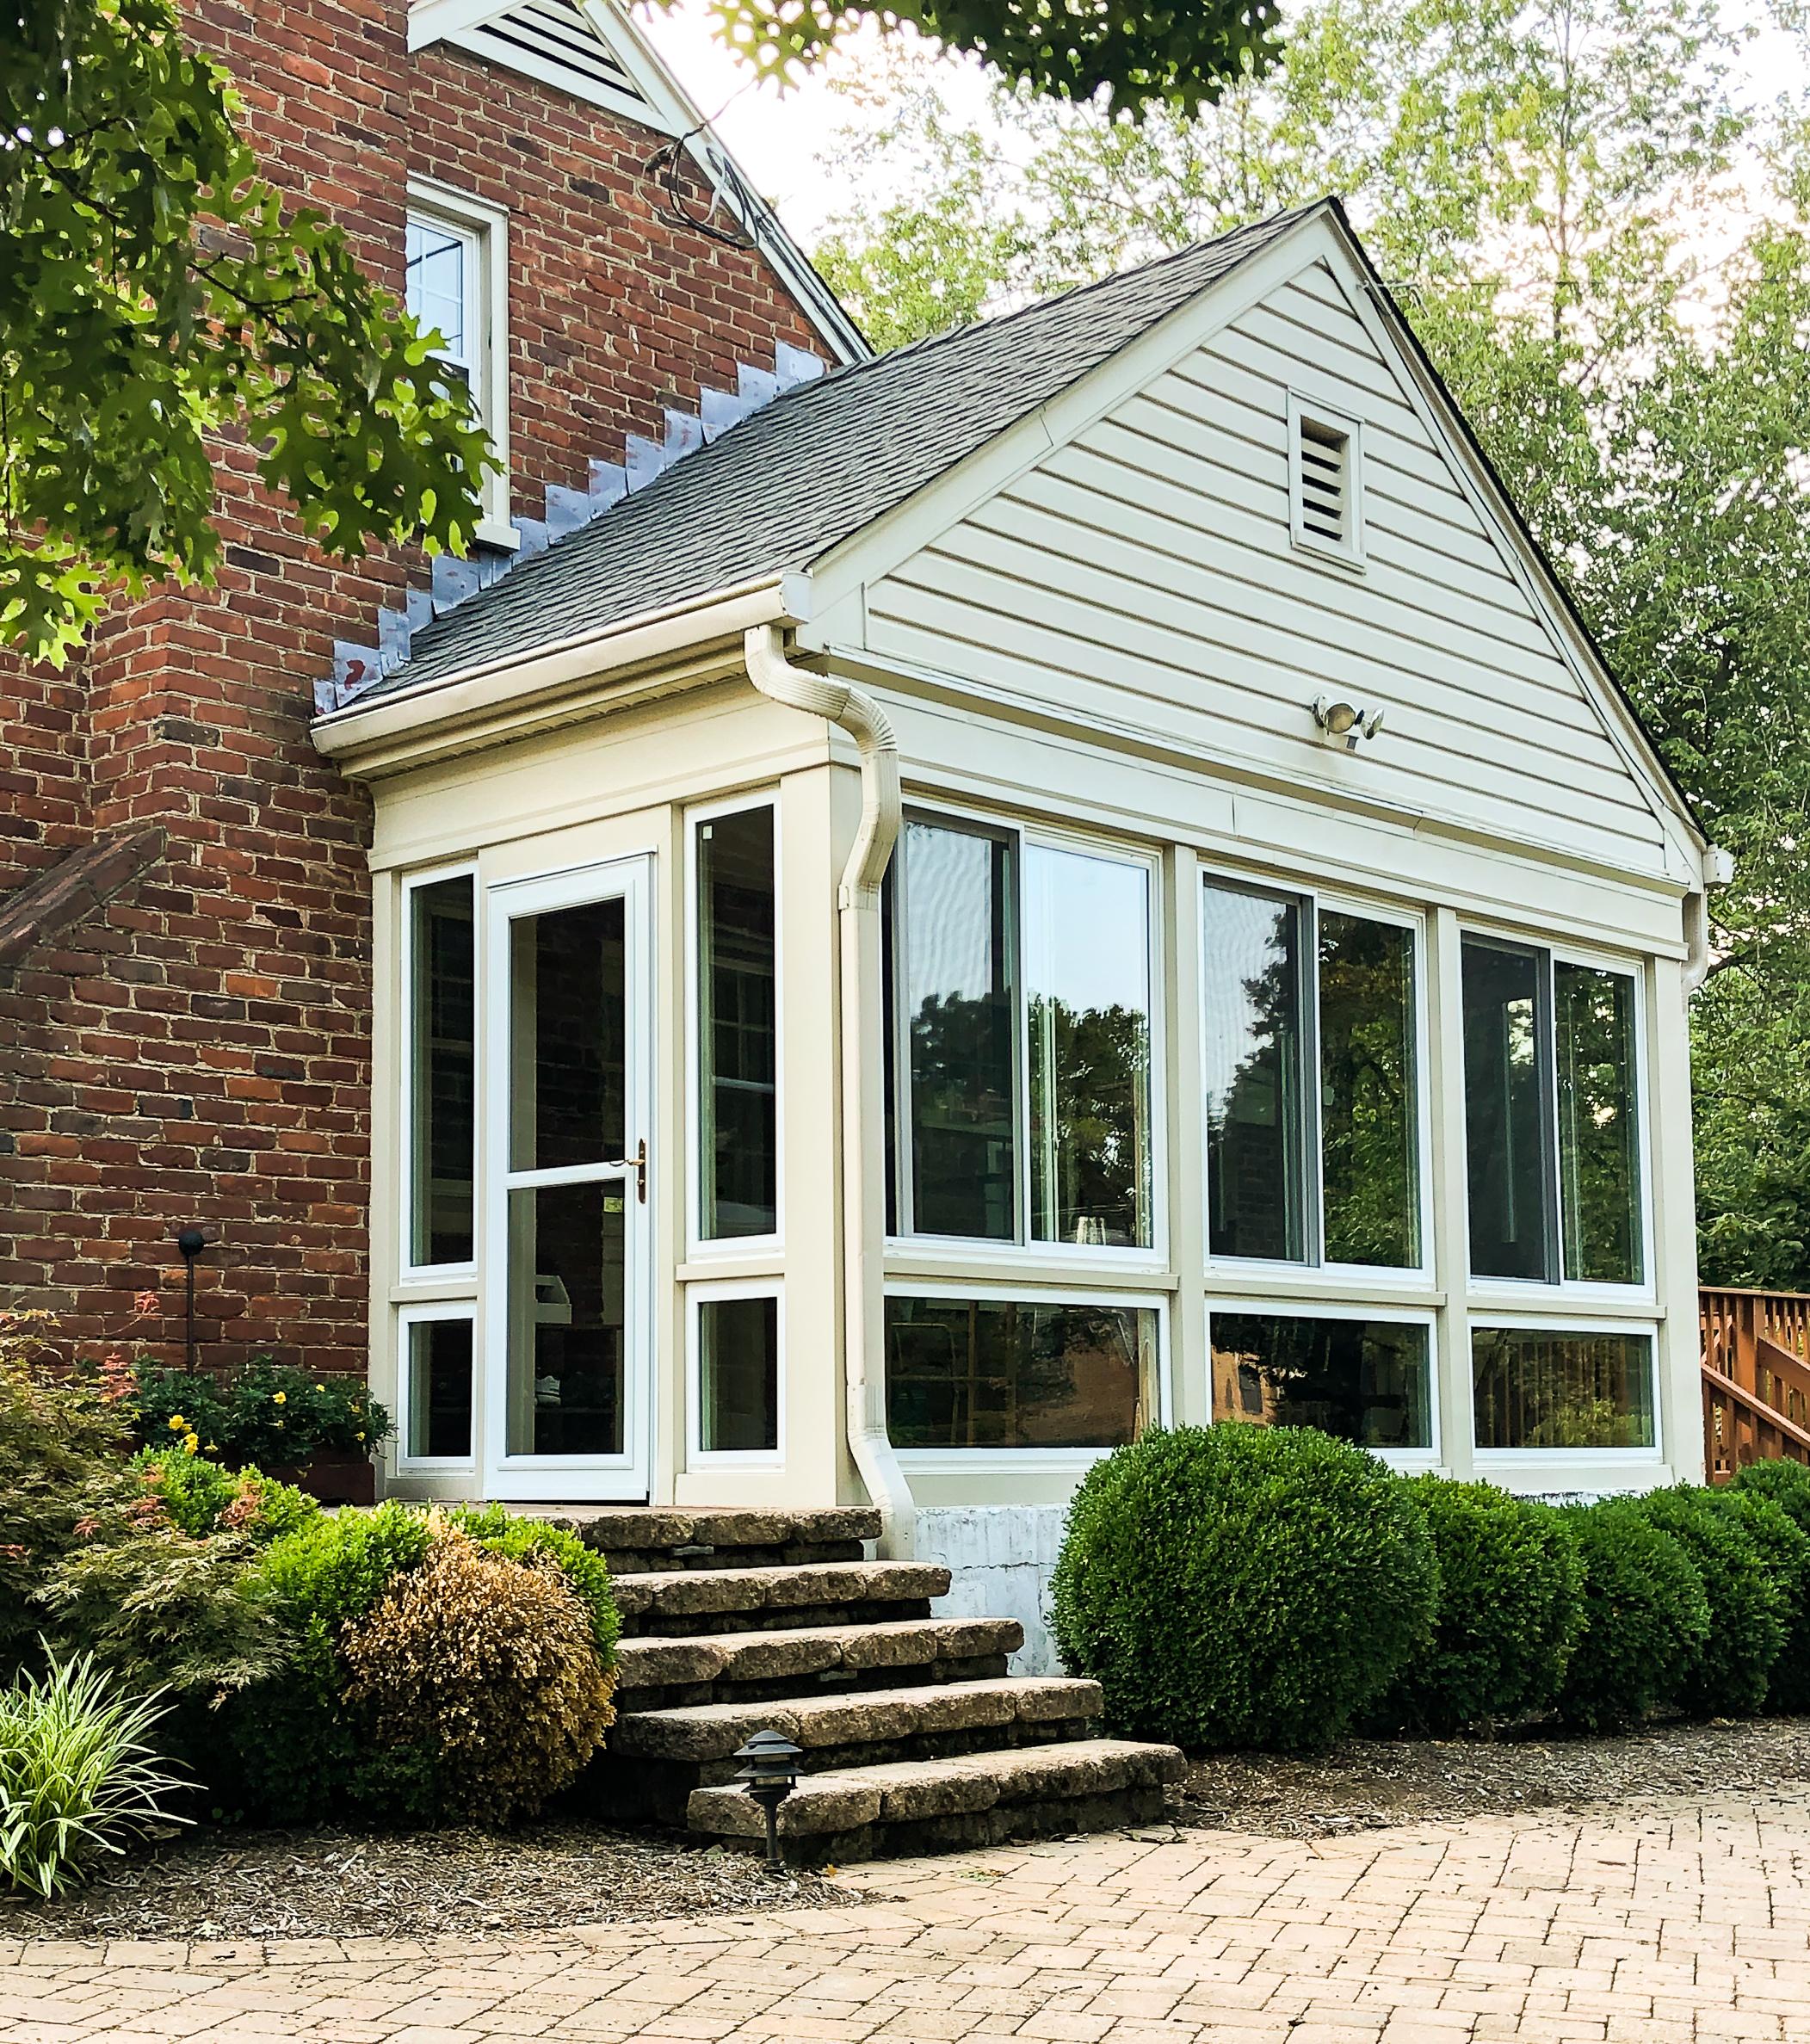 Porches Sunroom: Converting A Screened Porch To A Sunroom